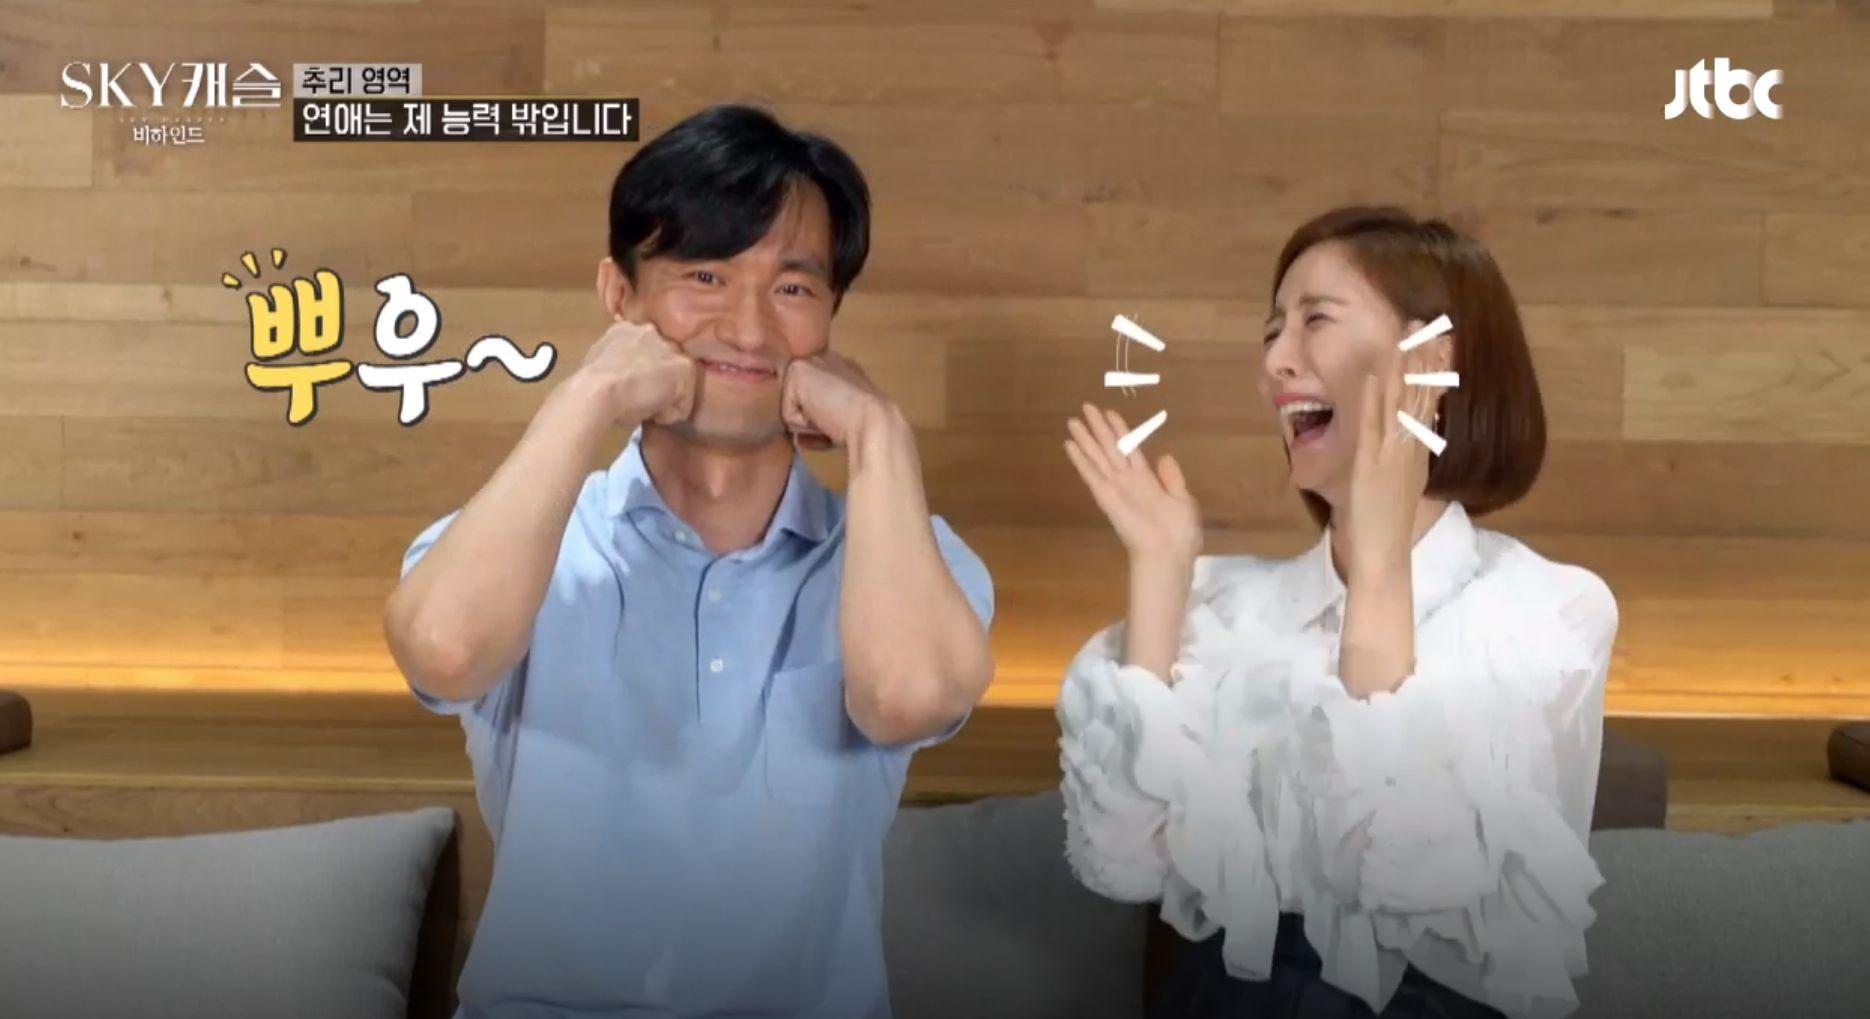 'SKY캐슬'의 차민혁과 노승혜 커플의 비하인드가